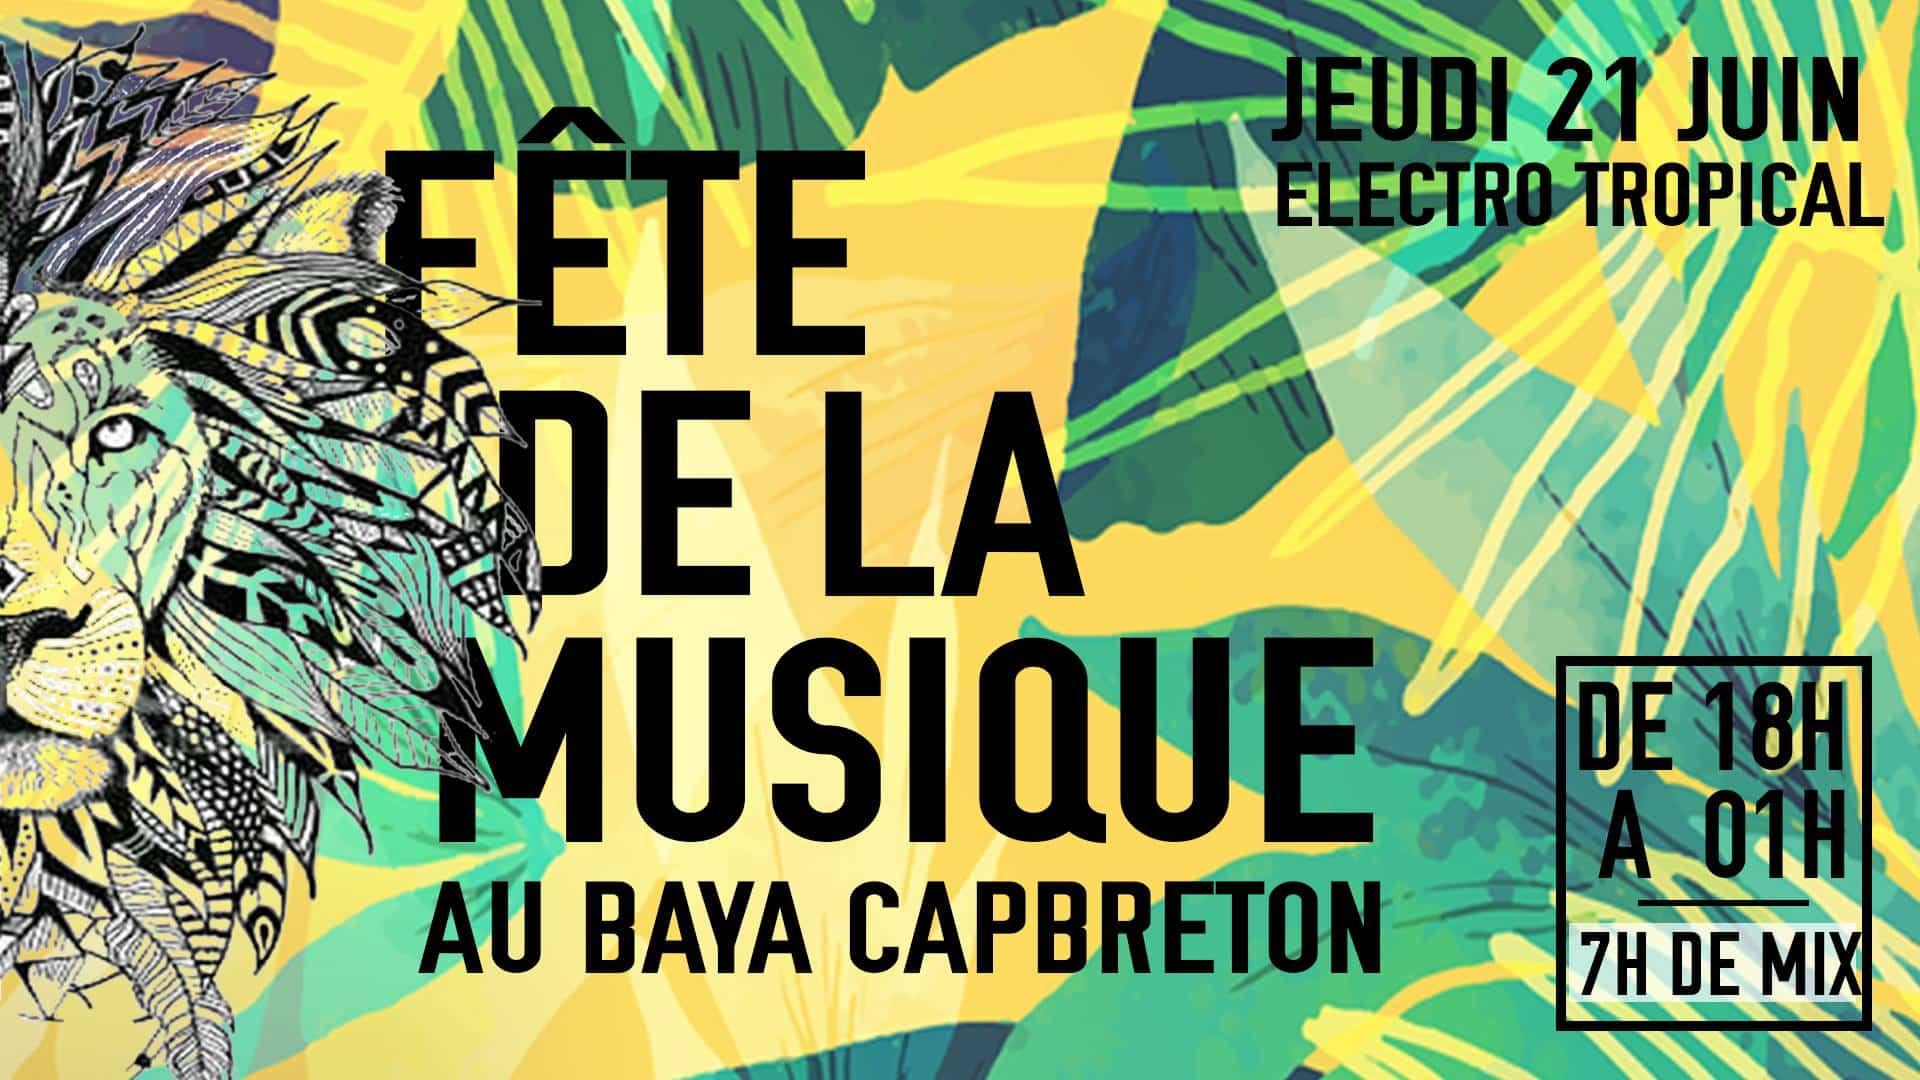 Fête de la musique baya hôtel capbreton dj set danse sunset